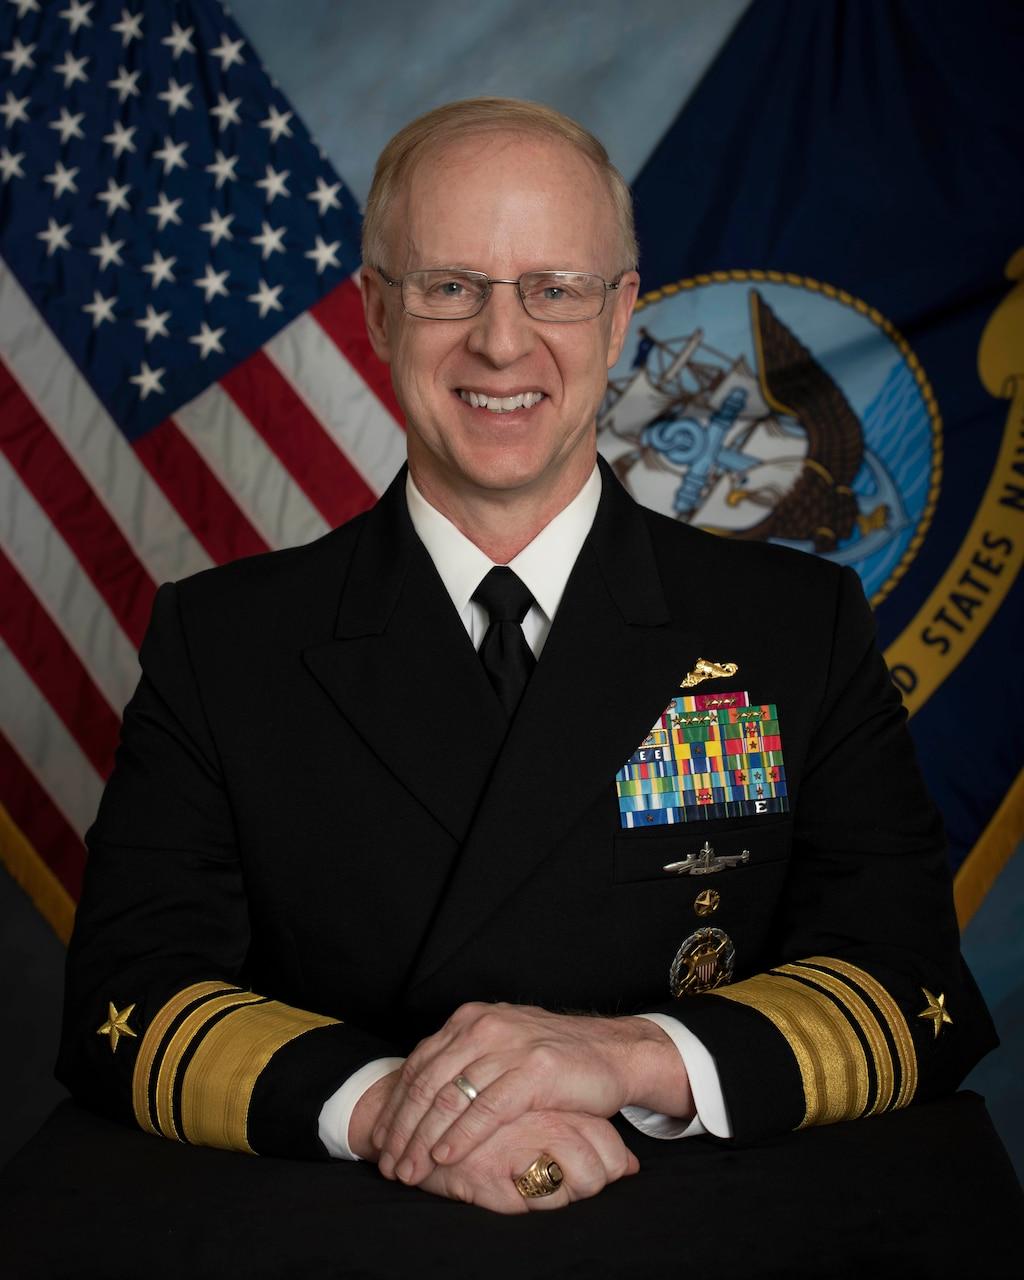 Vice Adm. Daryl Caudle, commander, Submarine Force Atlantic, official portrait.